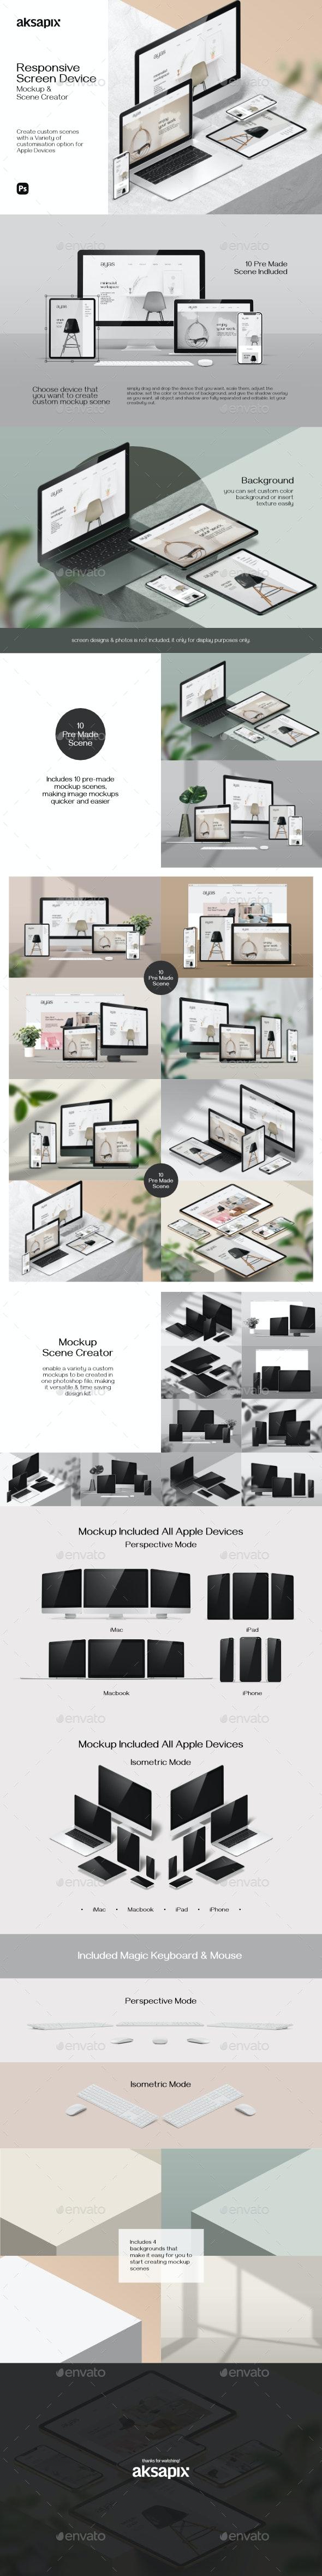 Responsive Screen Device - Mockup Scene Creator